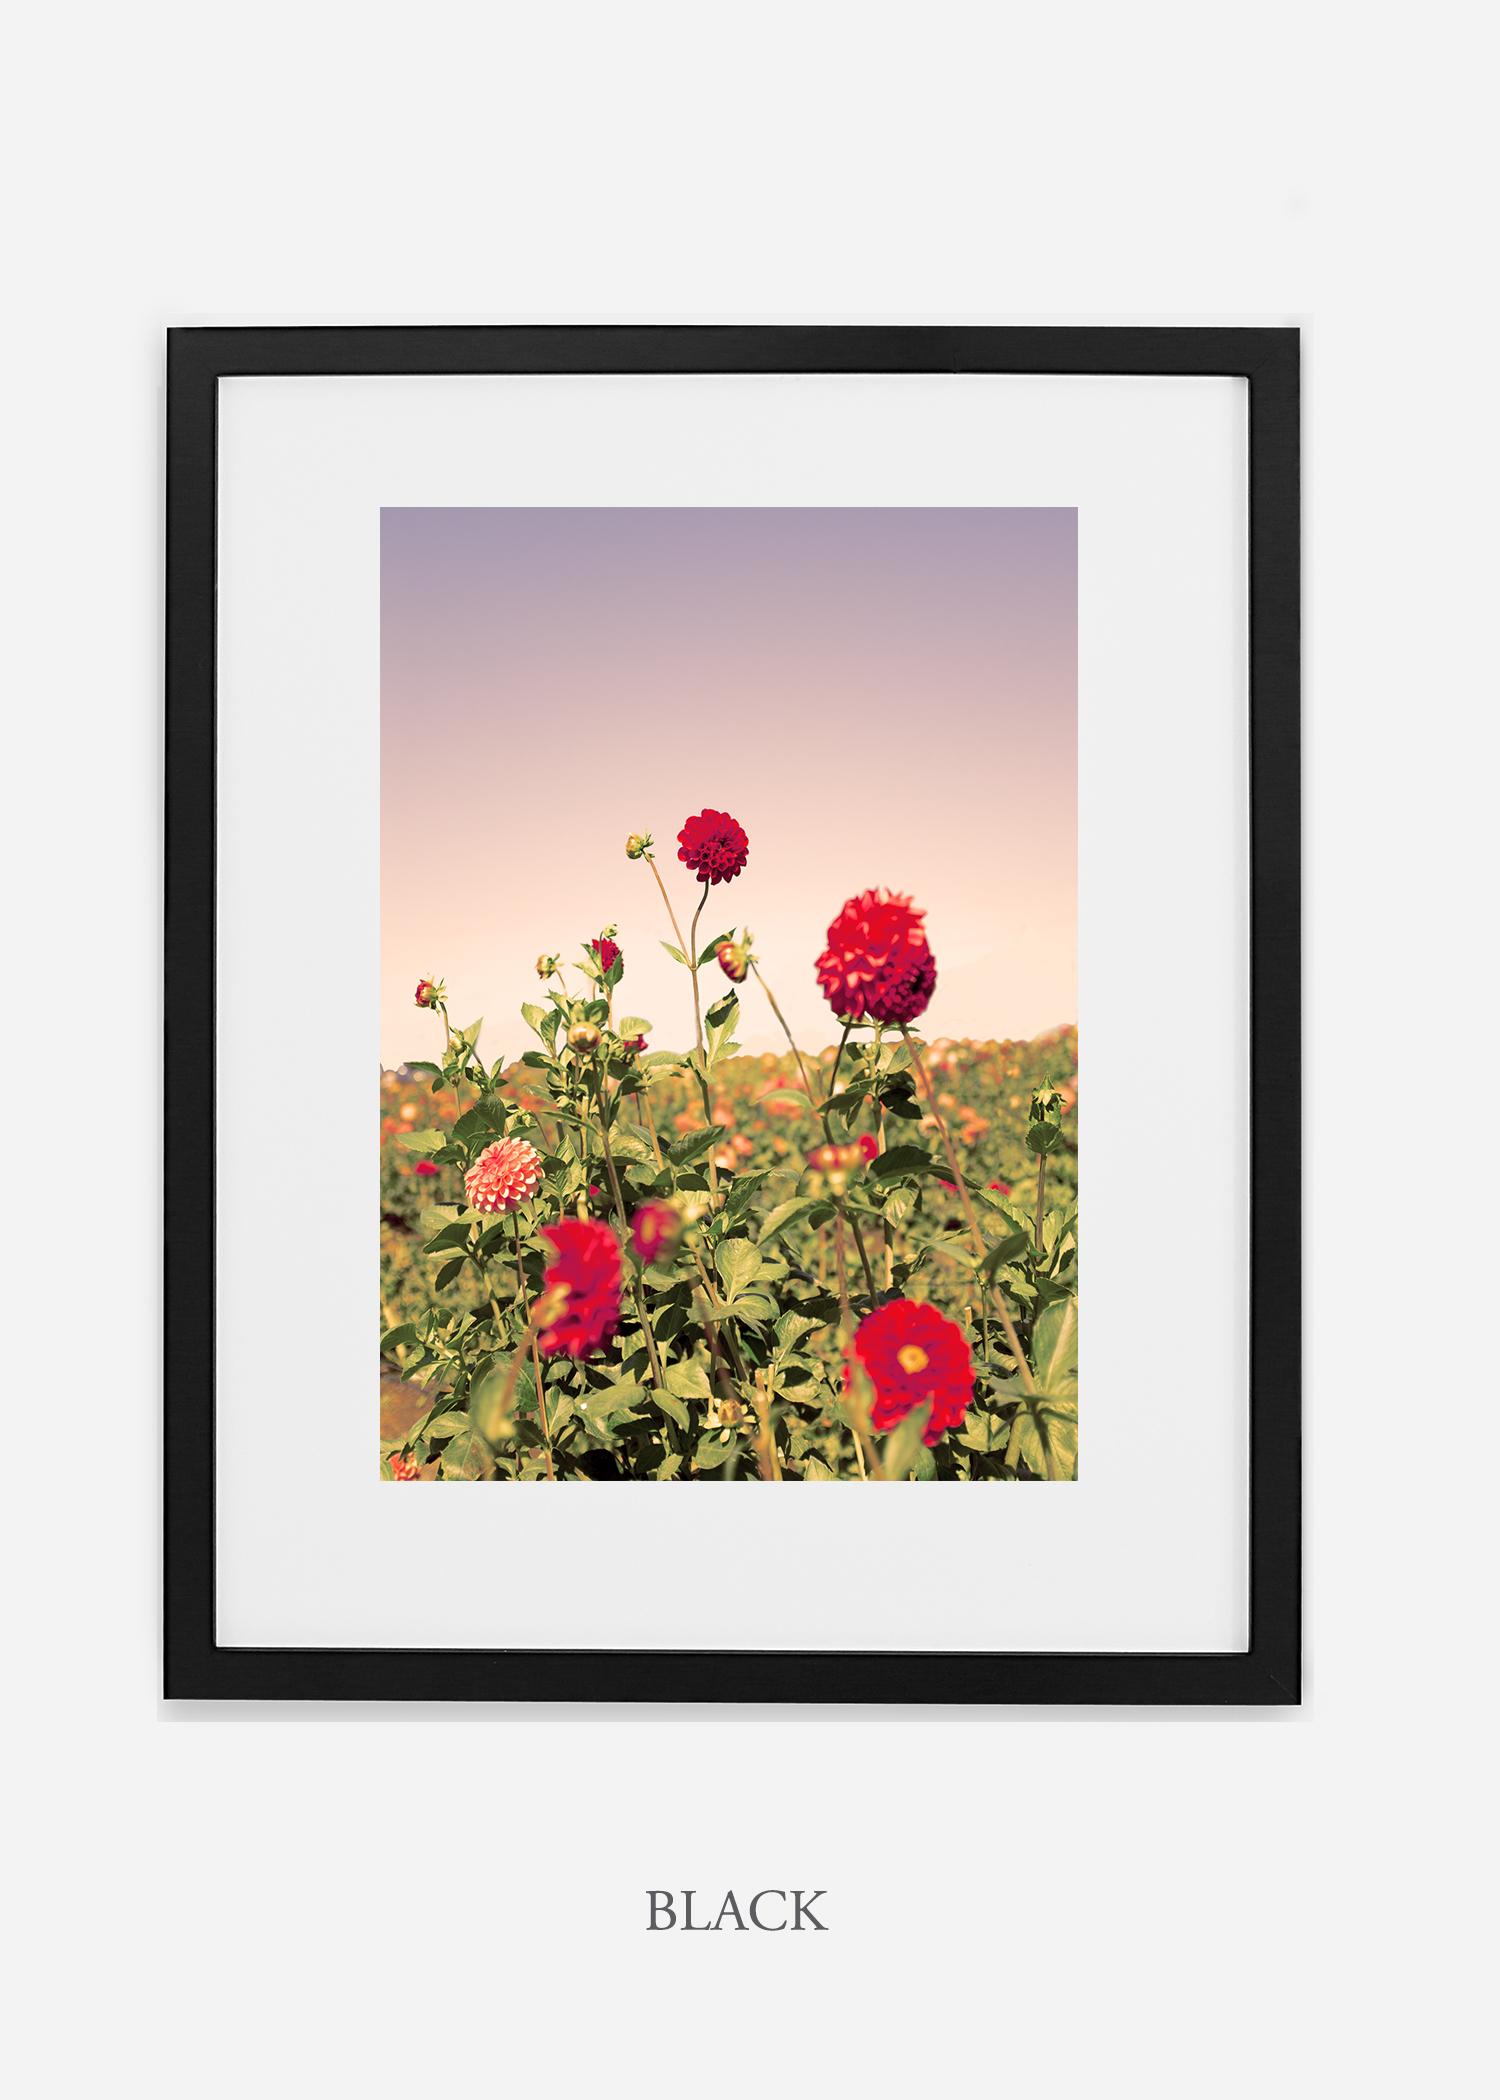 DahliaNo.8-black-frame-mat-interior-design-botanical-print-art-wilder-california-wilder-paper.jpg